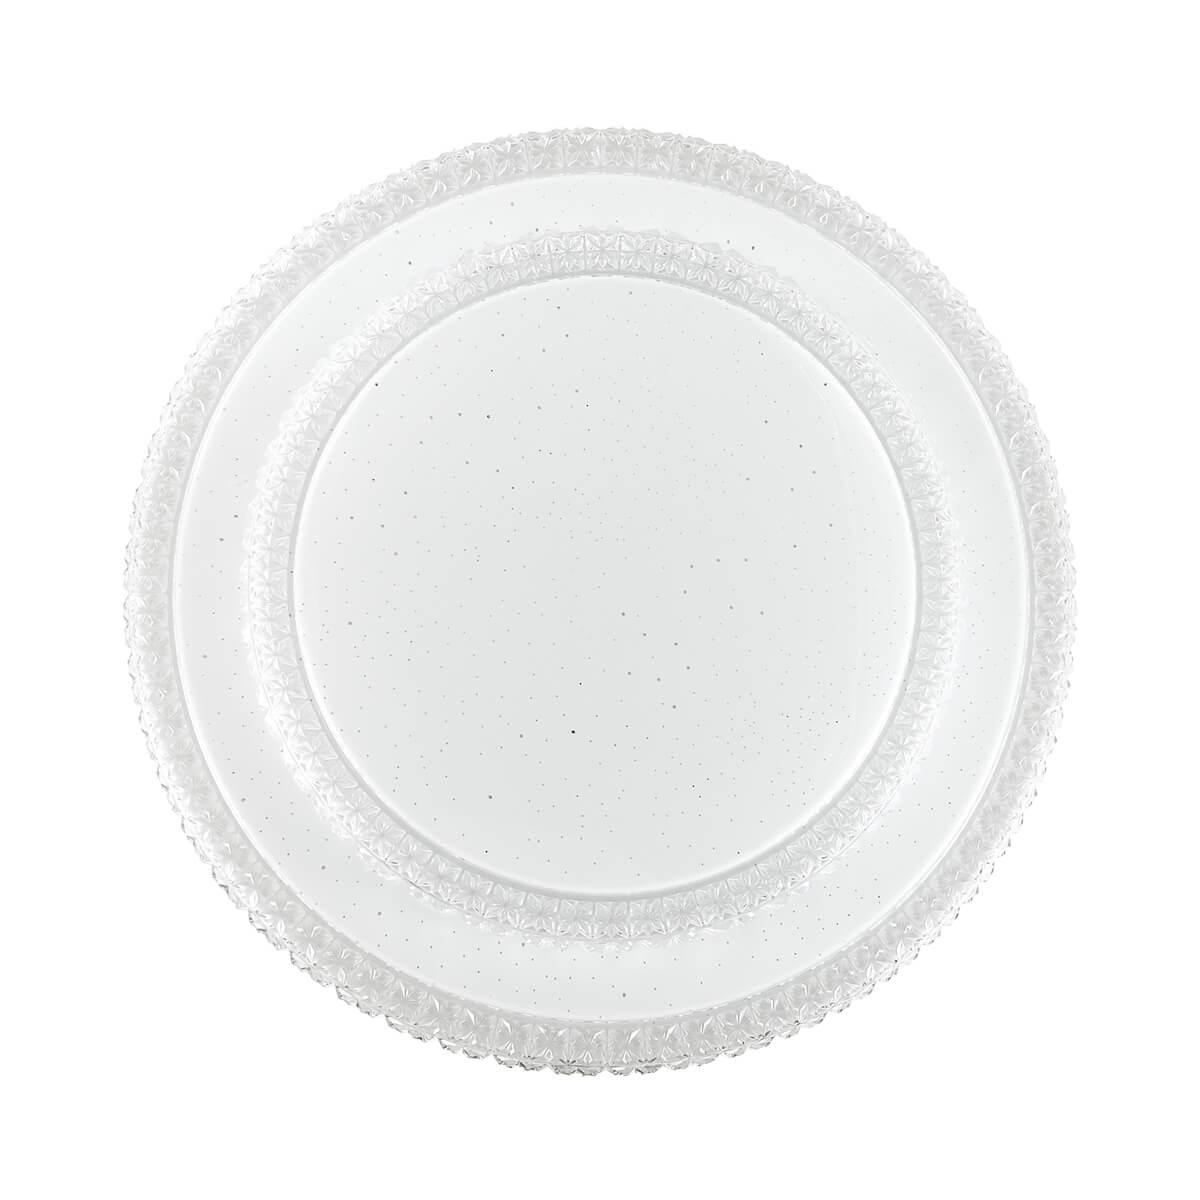 цены Светильник Sonex 2041/DL Floors